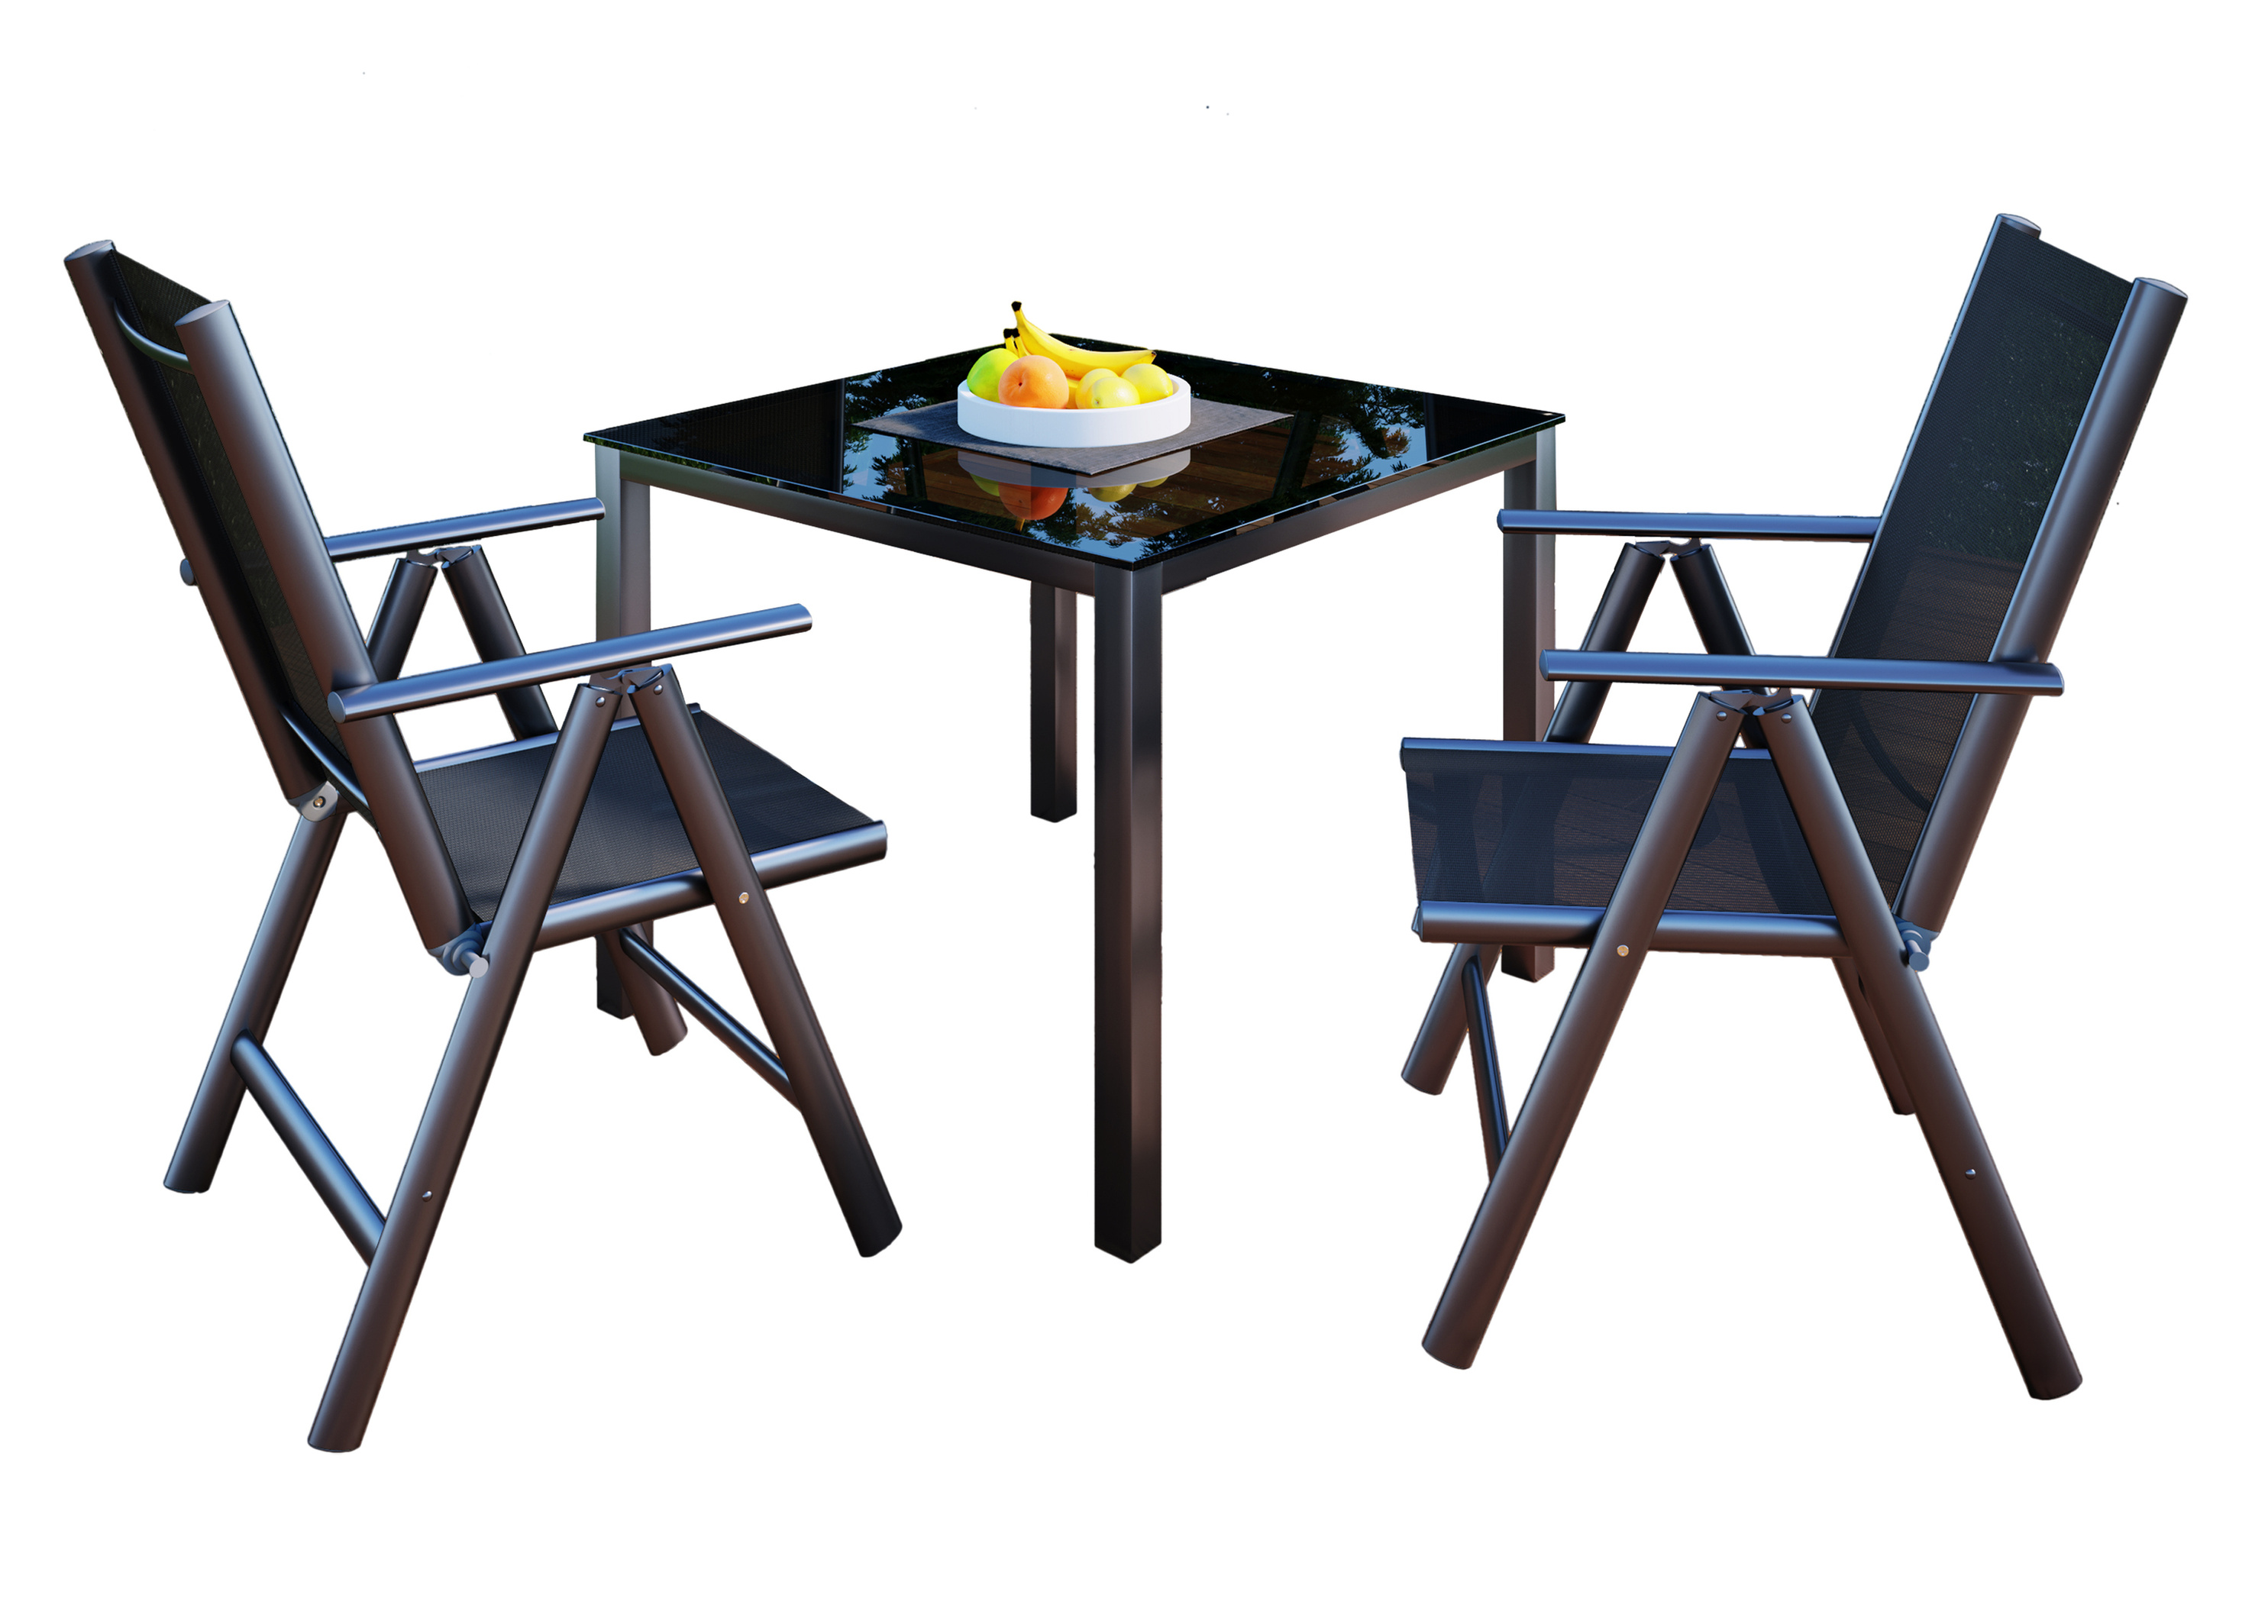 Vcm Alu Sitzgruppe 90x90 Gartenmobel Gartengarnitur Tisch Stuhl